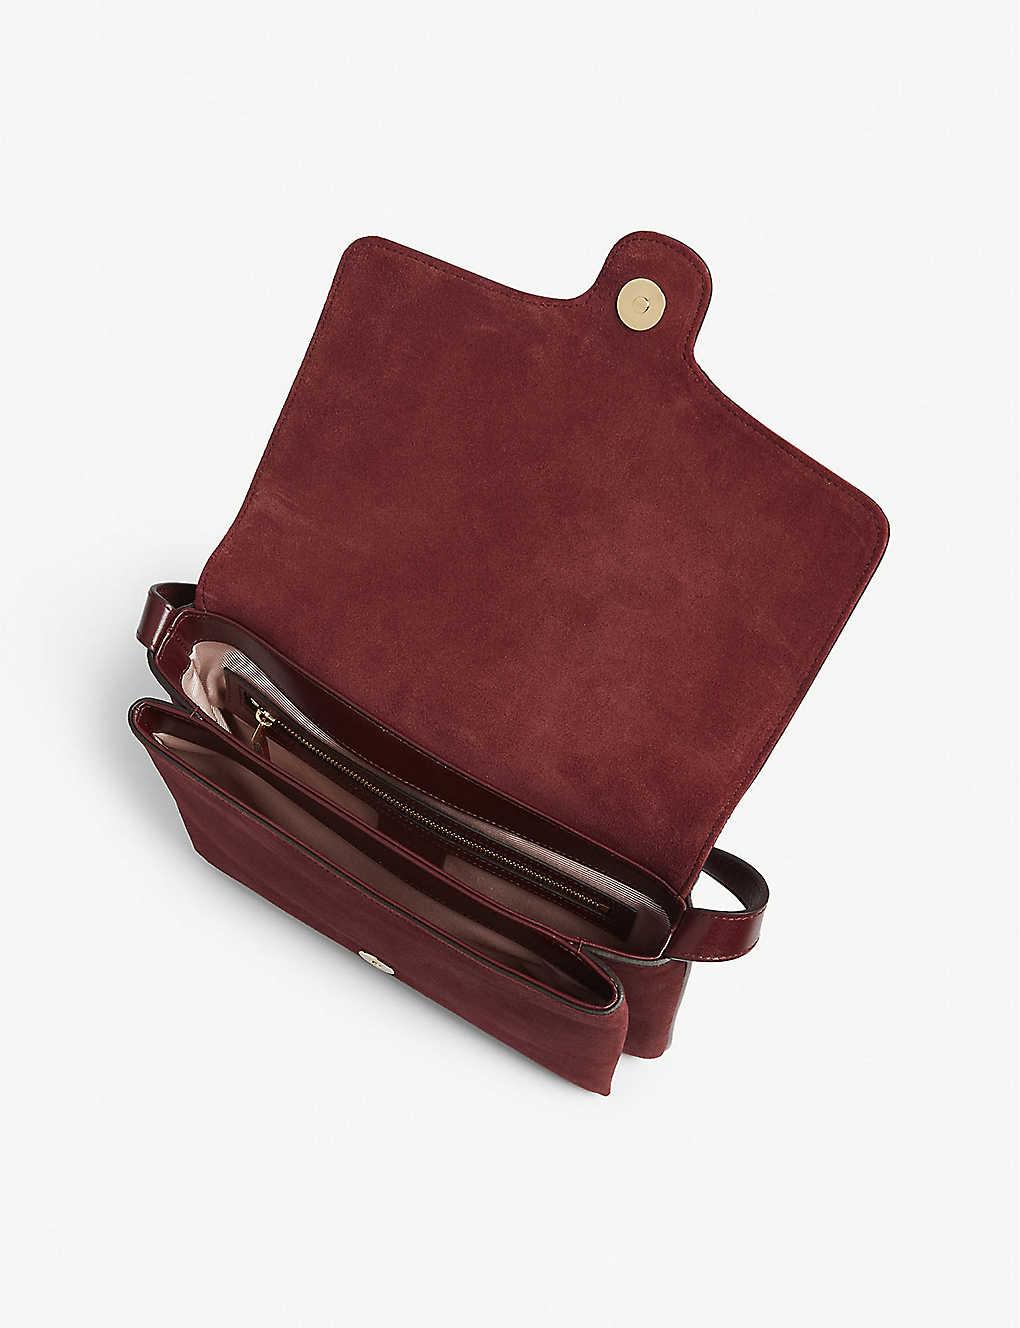 9eef2389b6b ... Arli shoulder bag - Burgendy